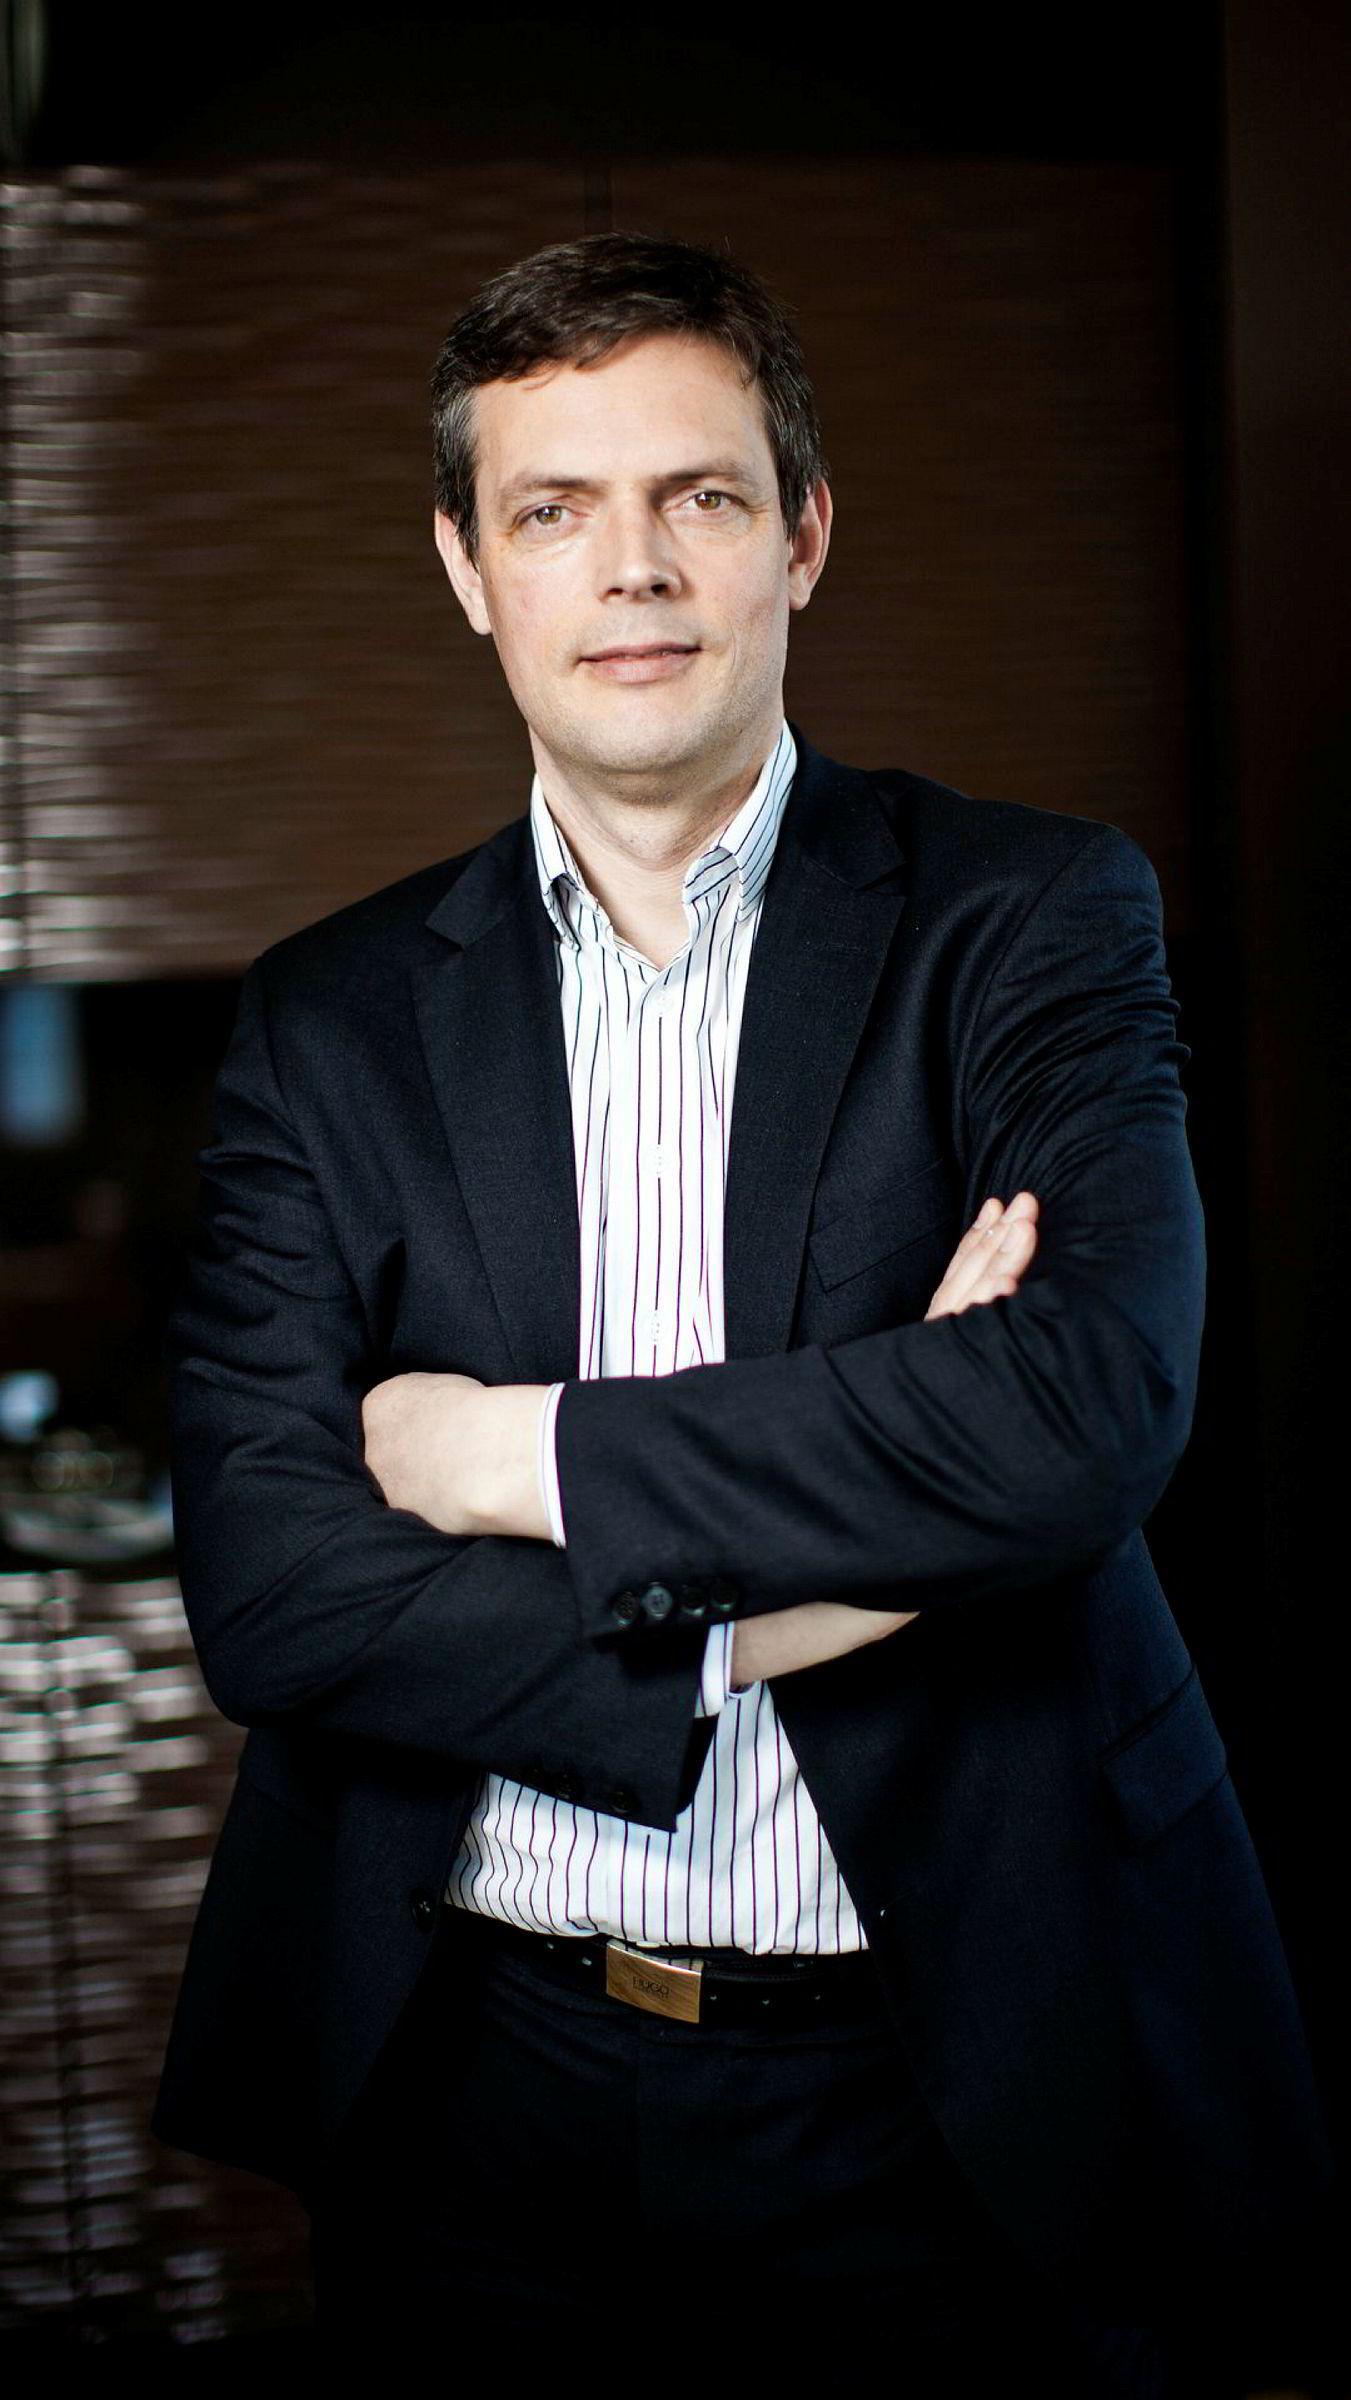 Råvaresjef Bjarne Schieldrop i SEB.